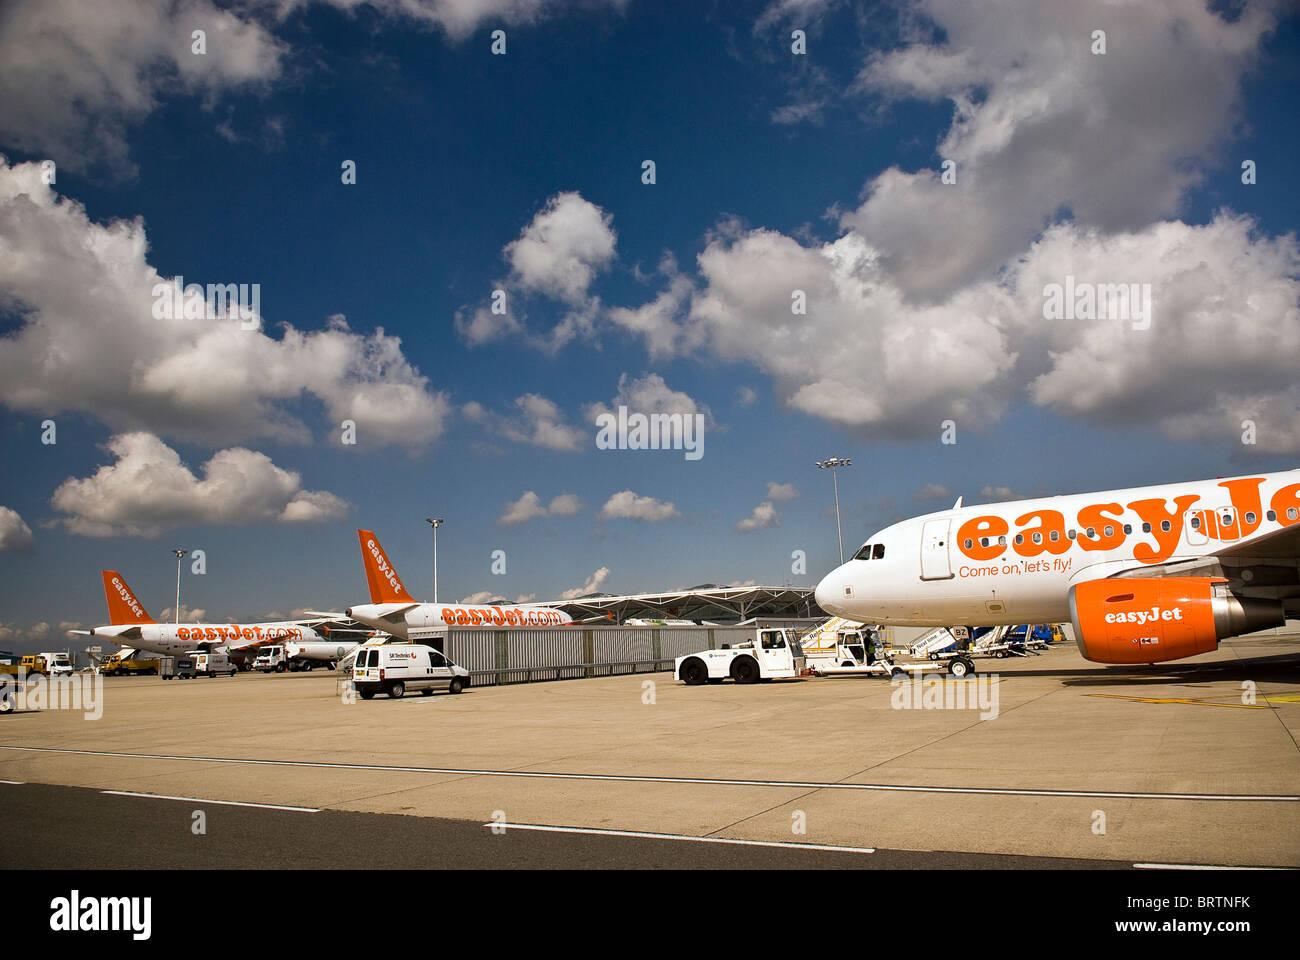 Jet aircraft loading and unloading at Bristol Airport, UK - Stock Image